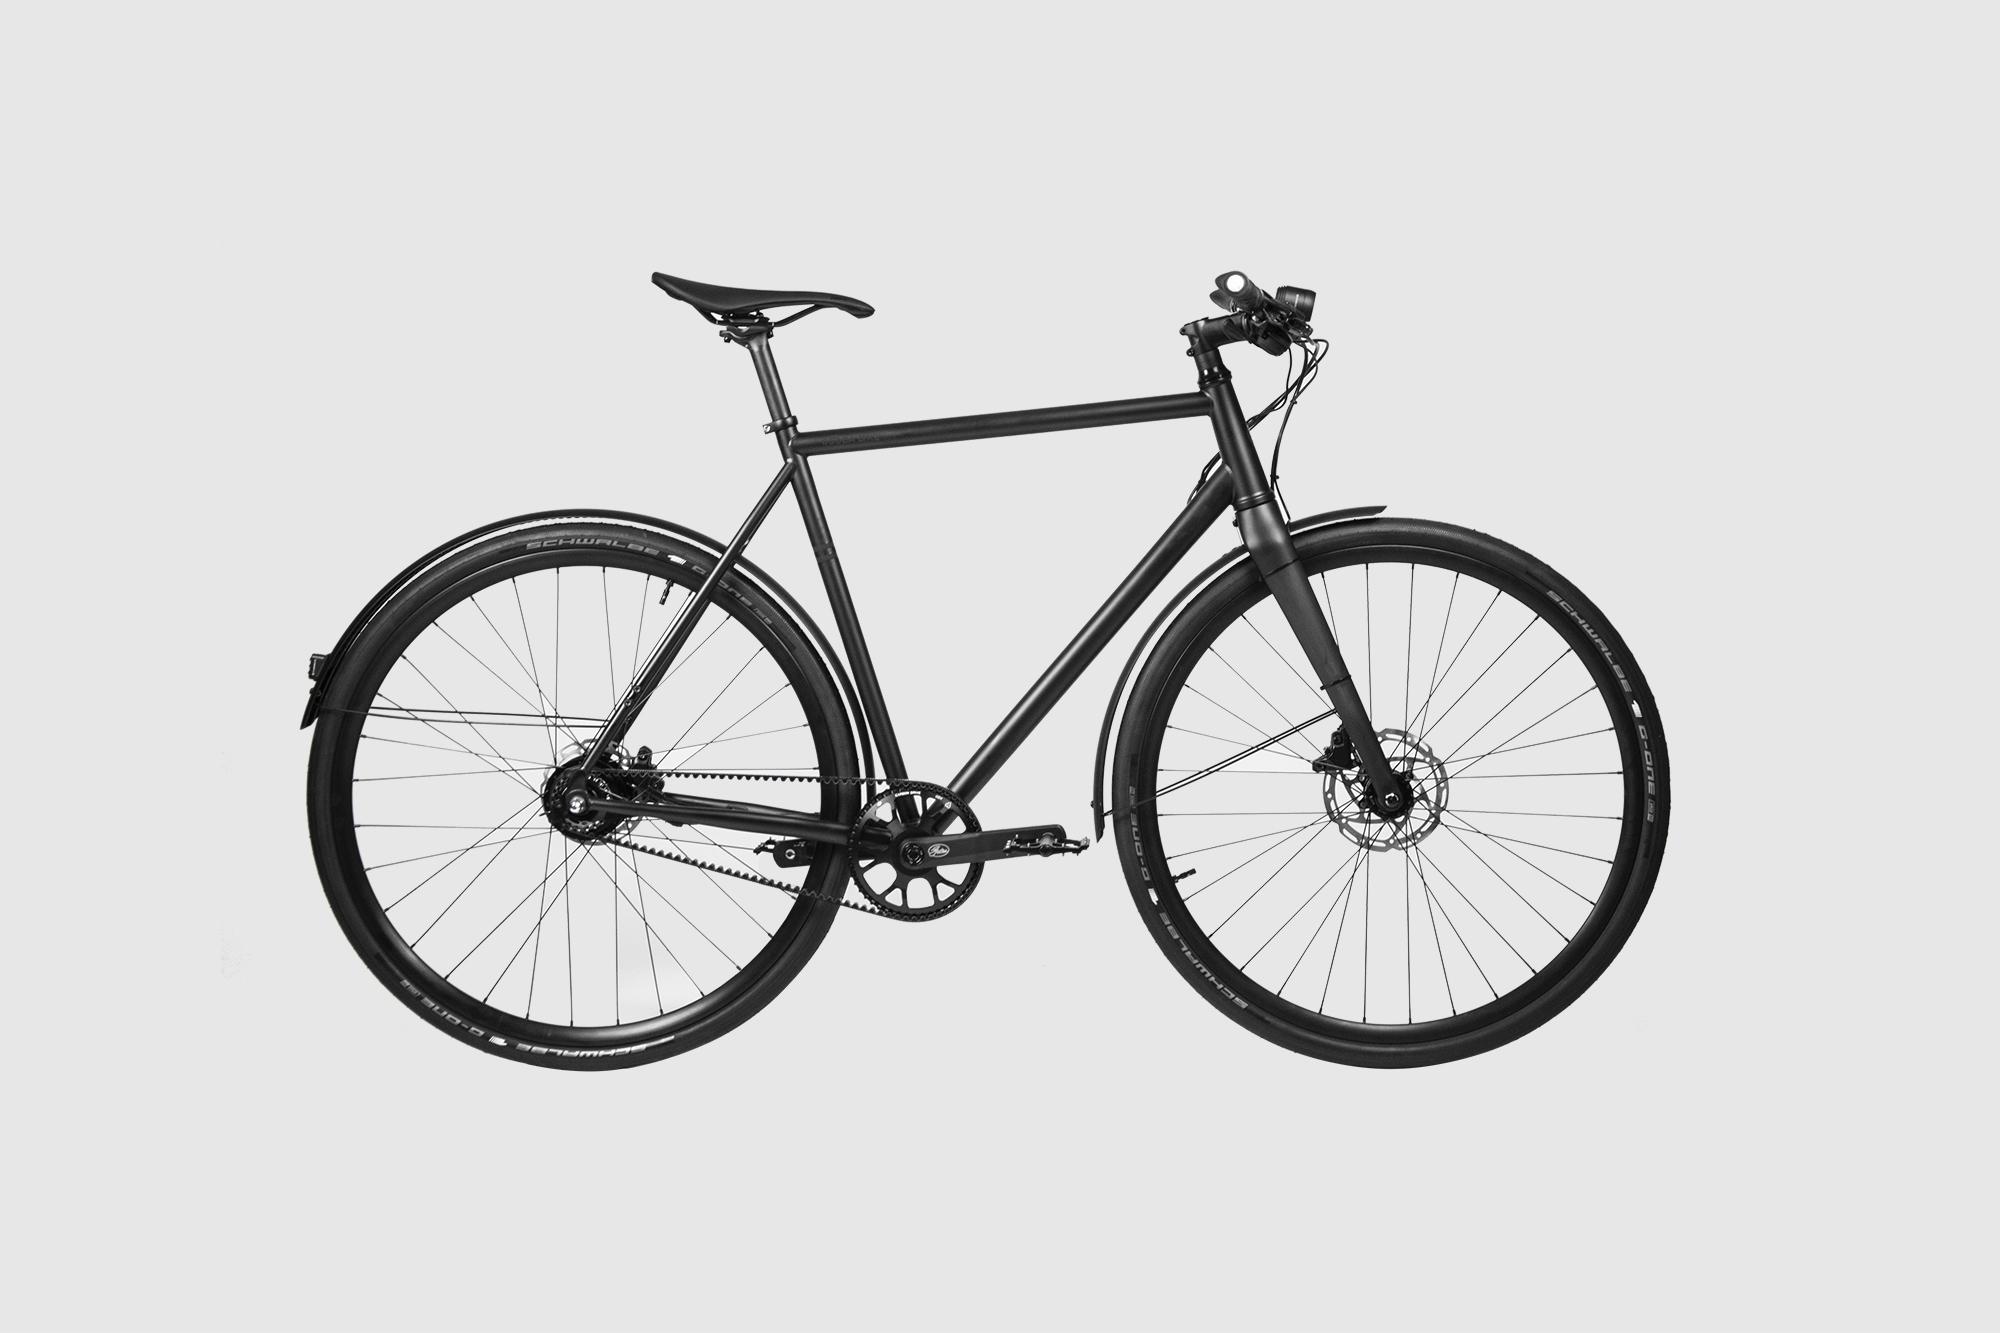 Booda Bike Tailor - Belt Driven Gear Hub premium Bike side view sml